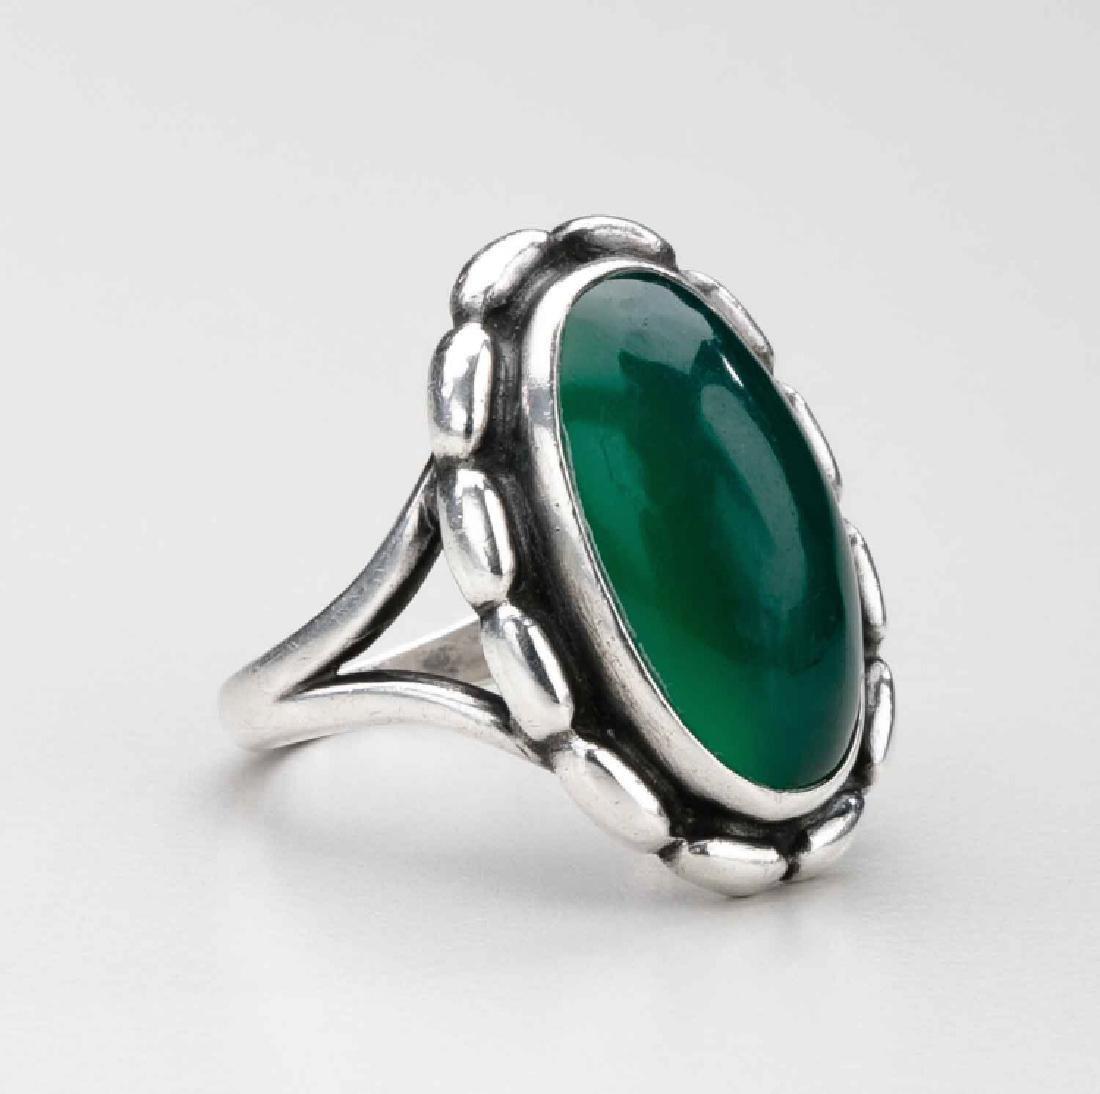 Georg Jensen Sterling Silver Green Agate Ring